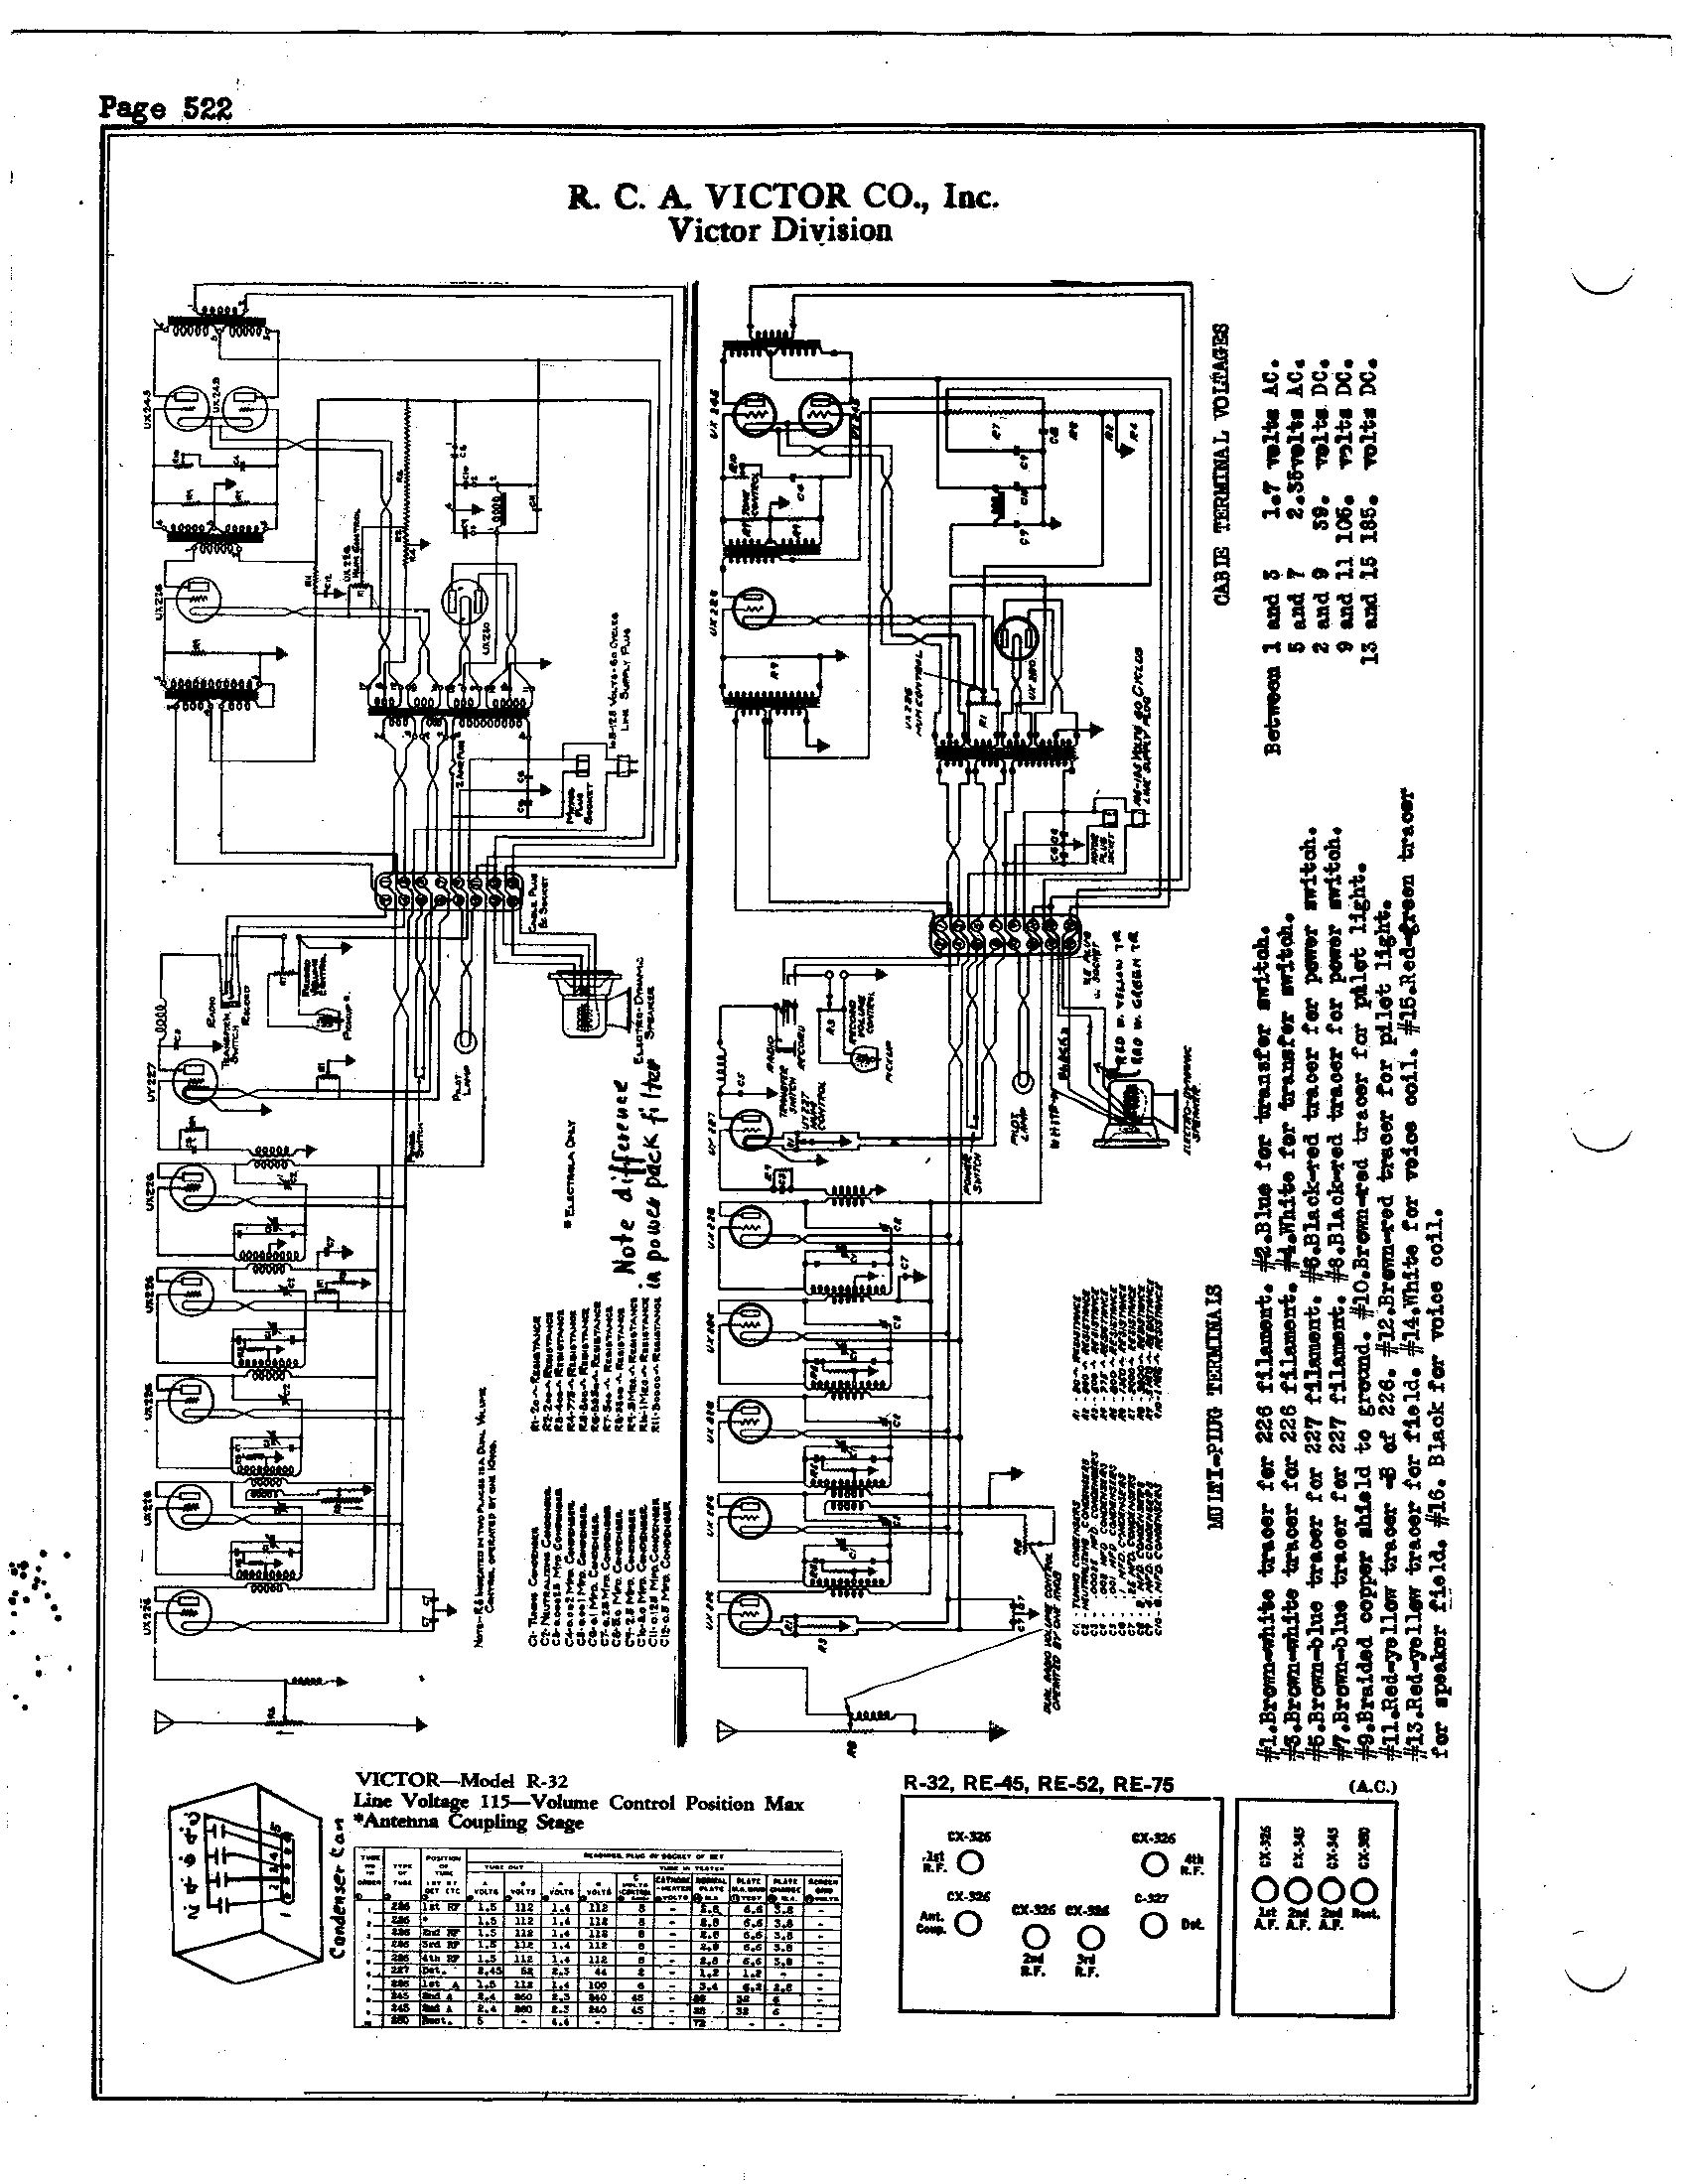 RCA Victor Co., Inc. R-32 Schematic